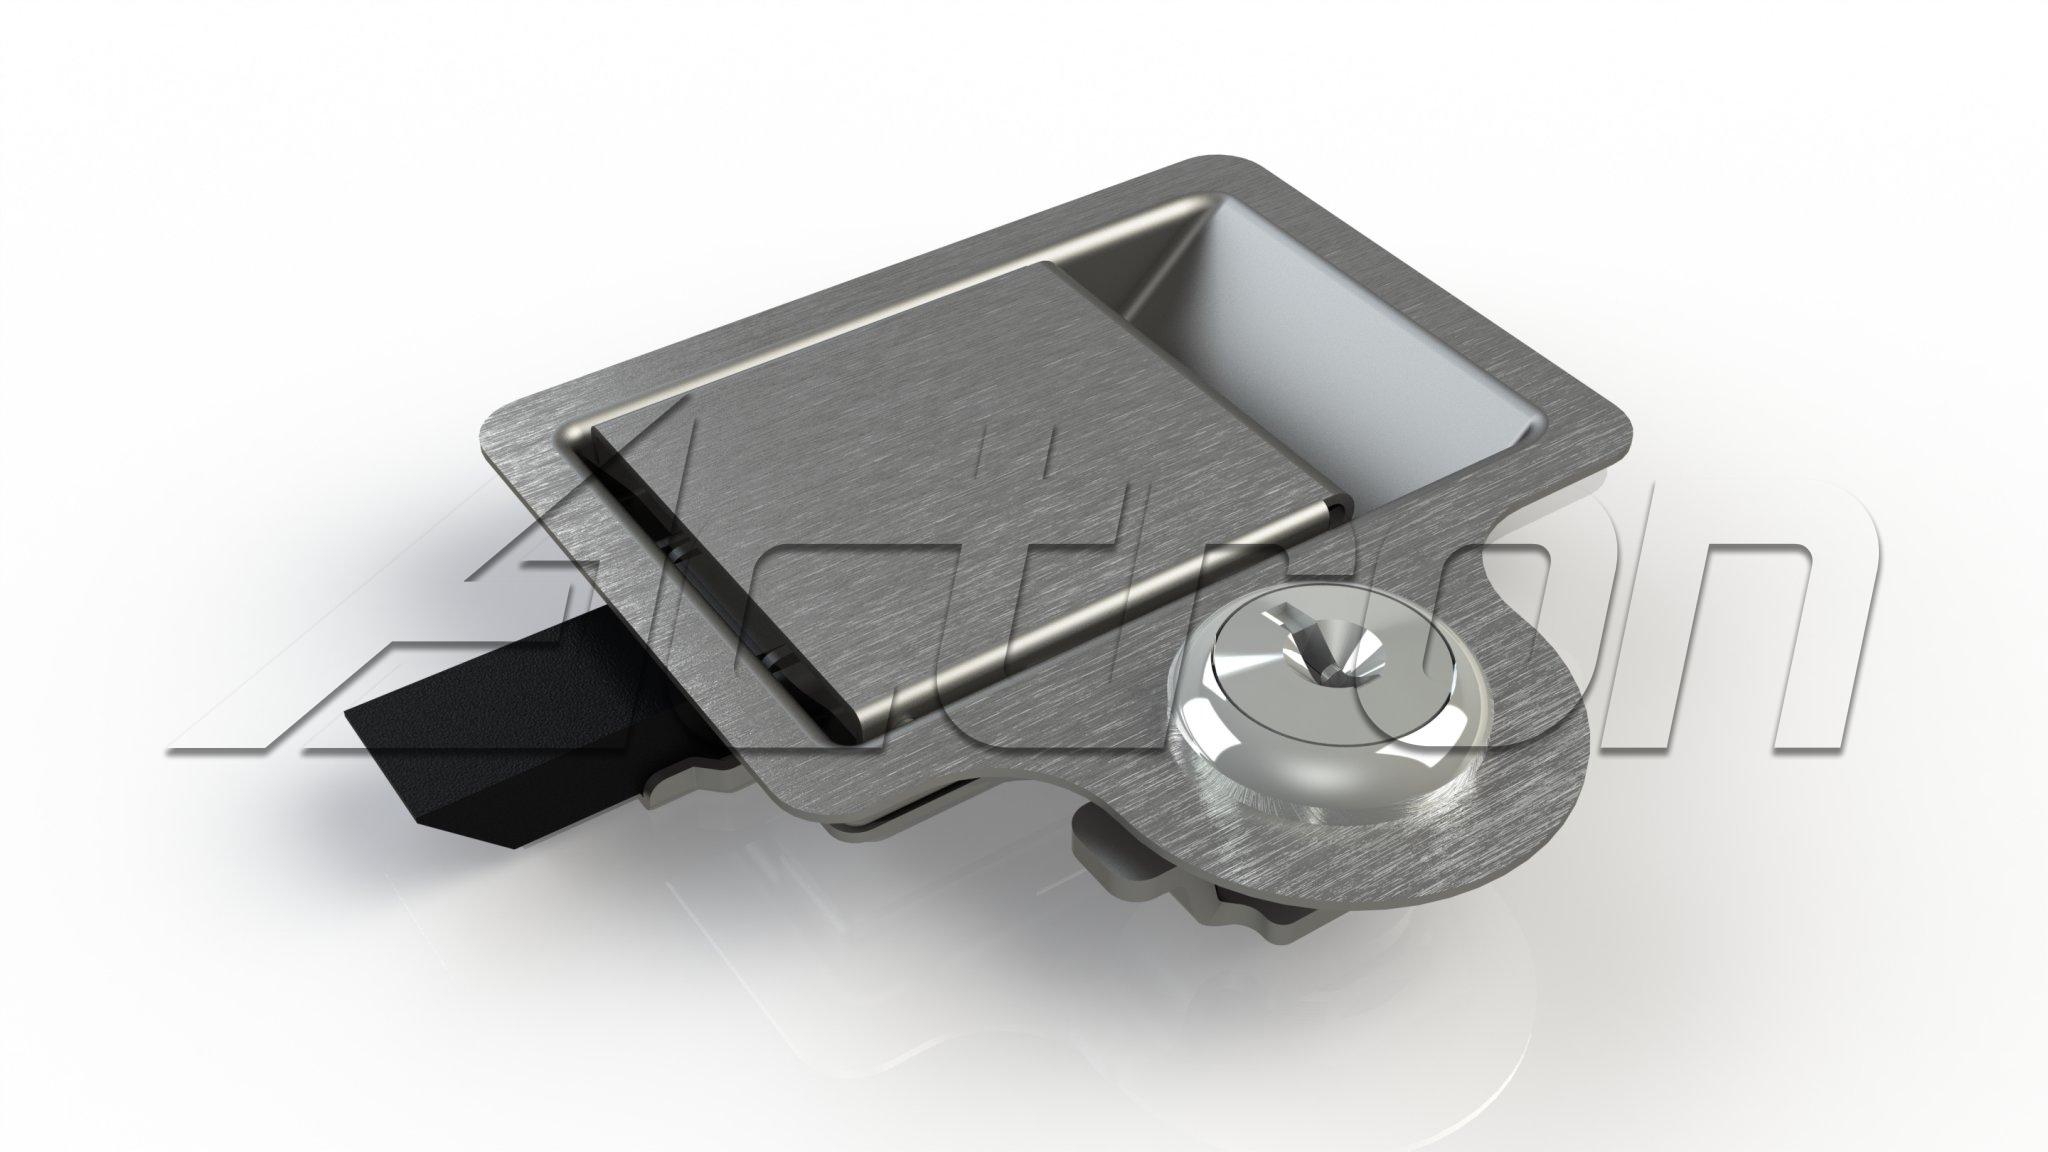 latchlock-assy-8211-paddle-4083-a25011.jpg